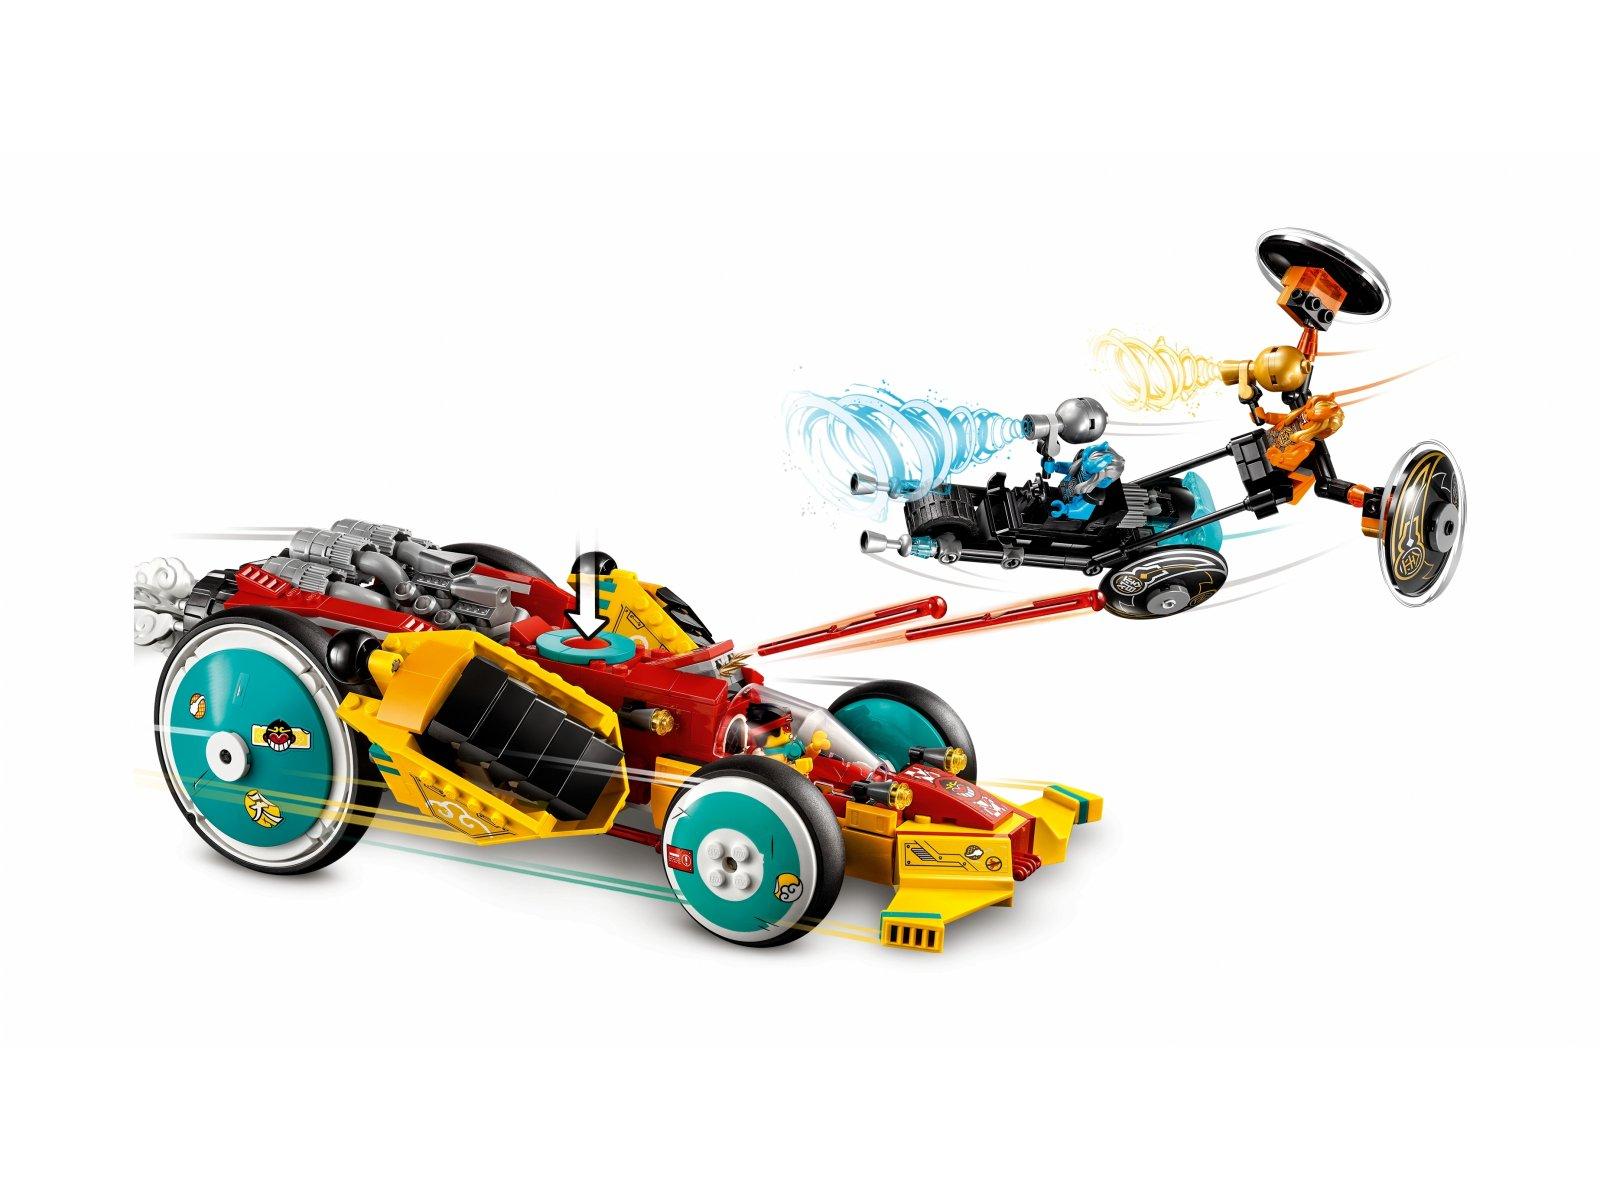 LEGO 80015 Monkie Kid™ Chmurkowy roadster Monkie Kida